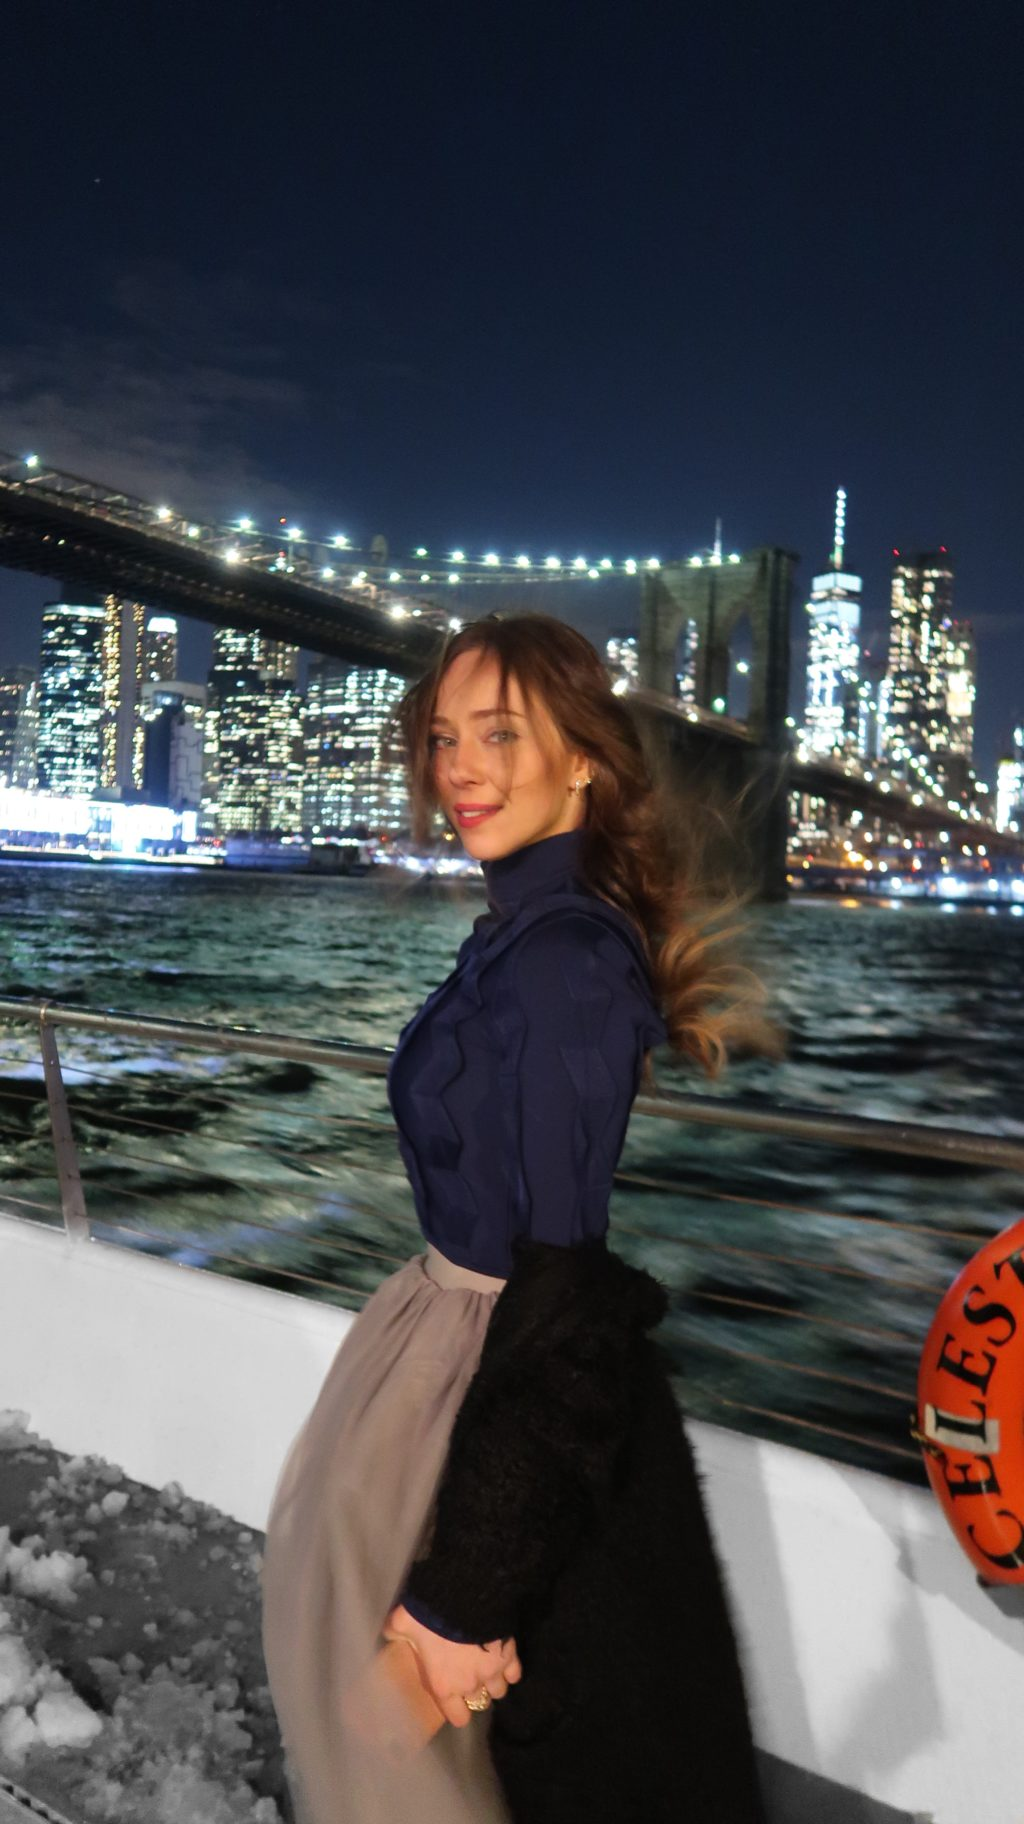 Laura Kassab no jantar no barco Bateaux em Manhattan NY